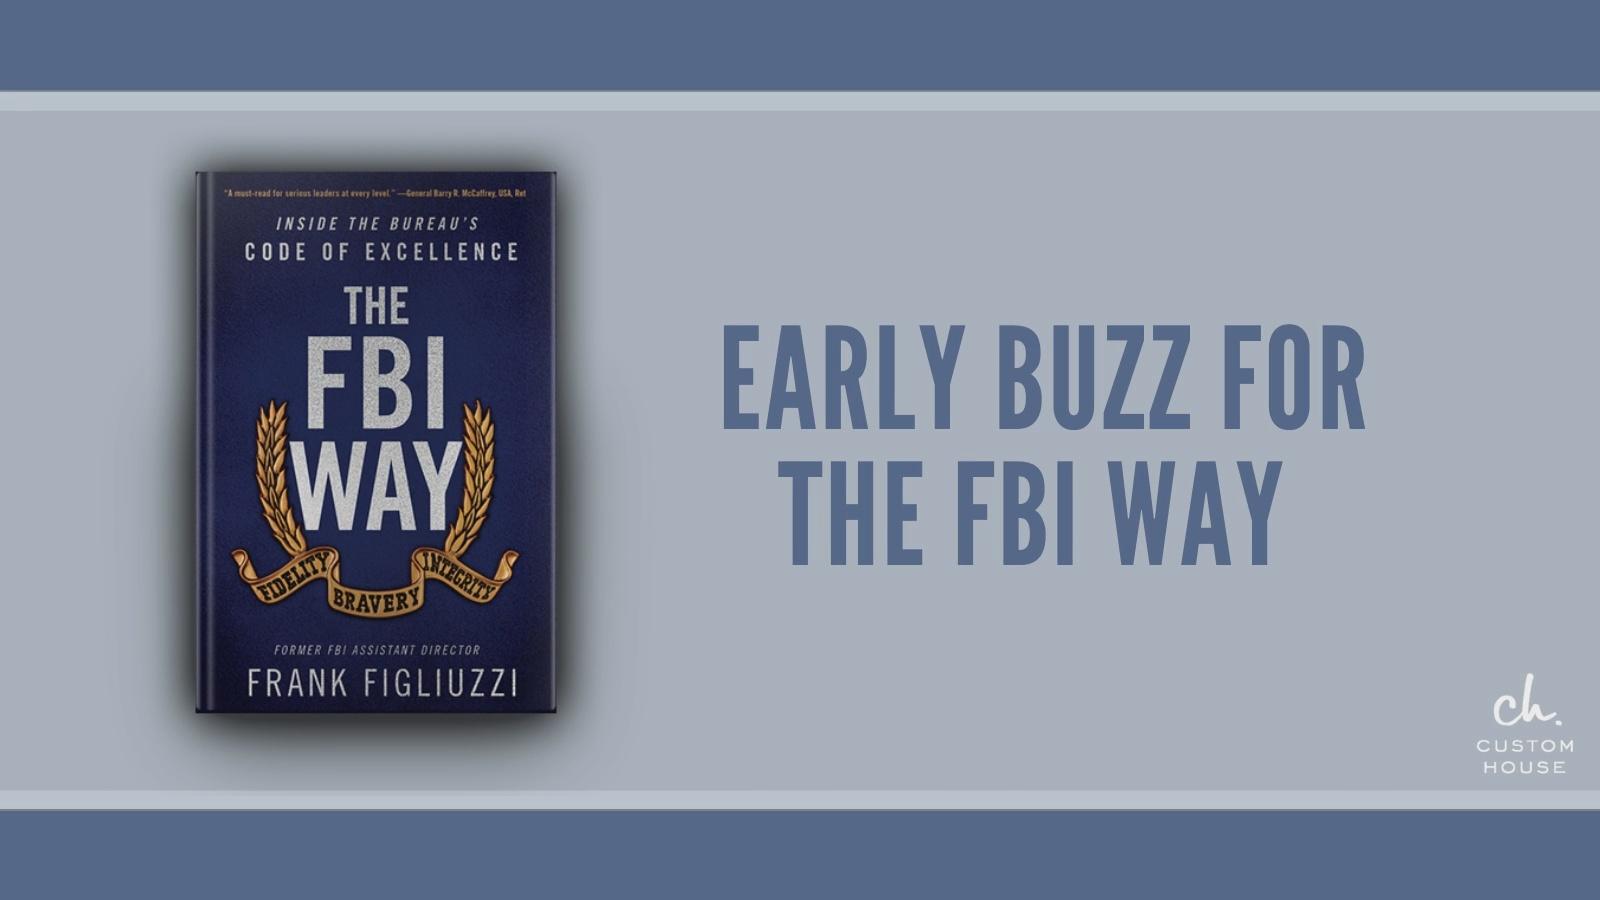 The FBI Way-Inside the Bureau's Code of Excellence